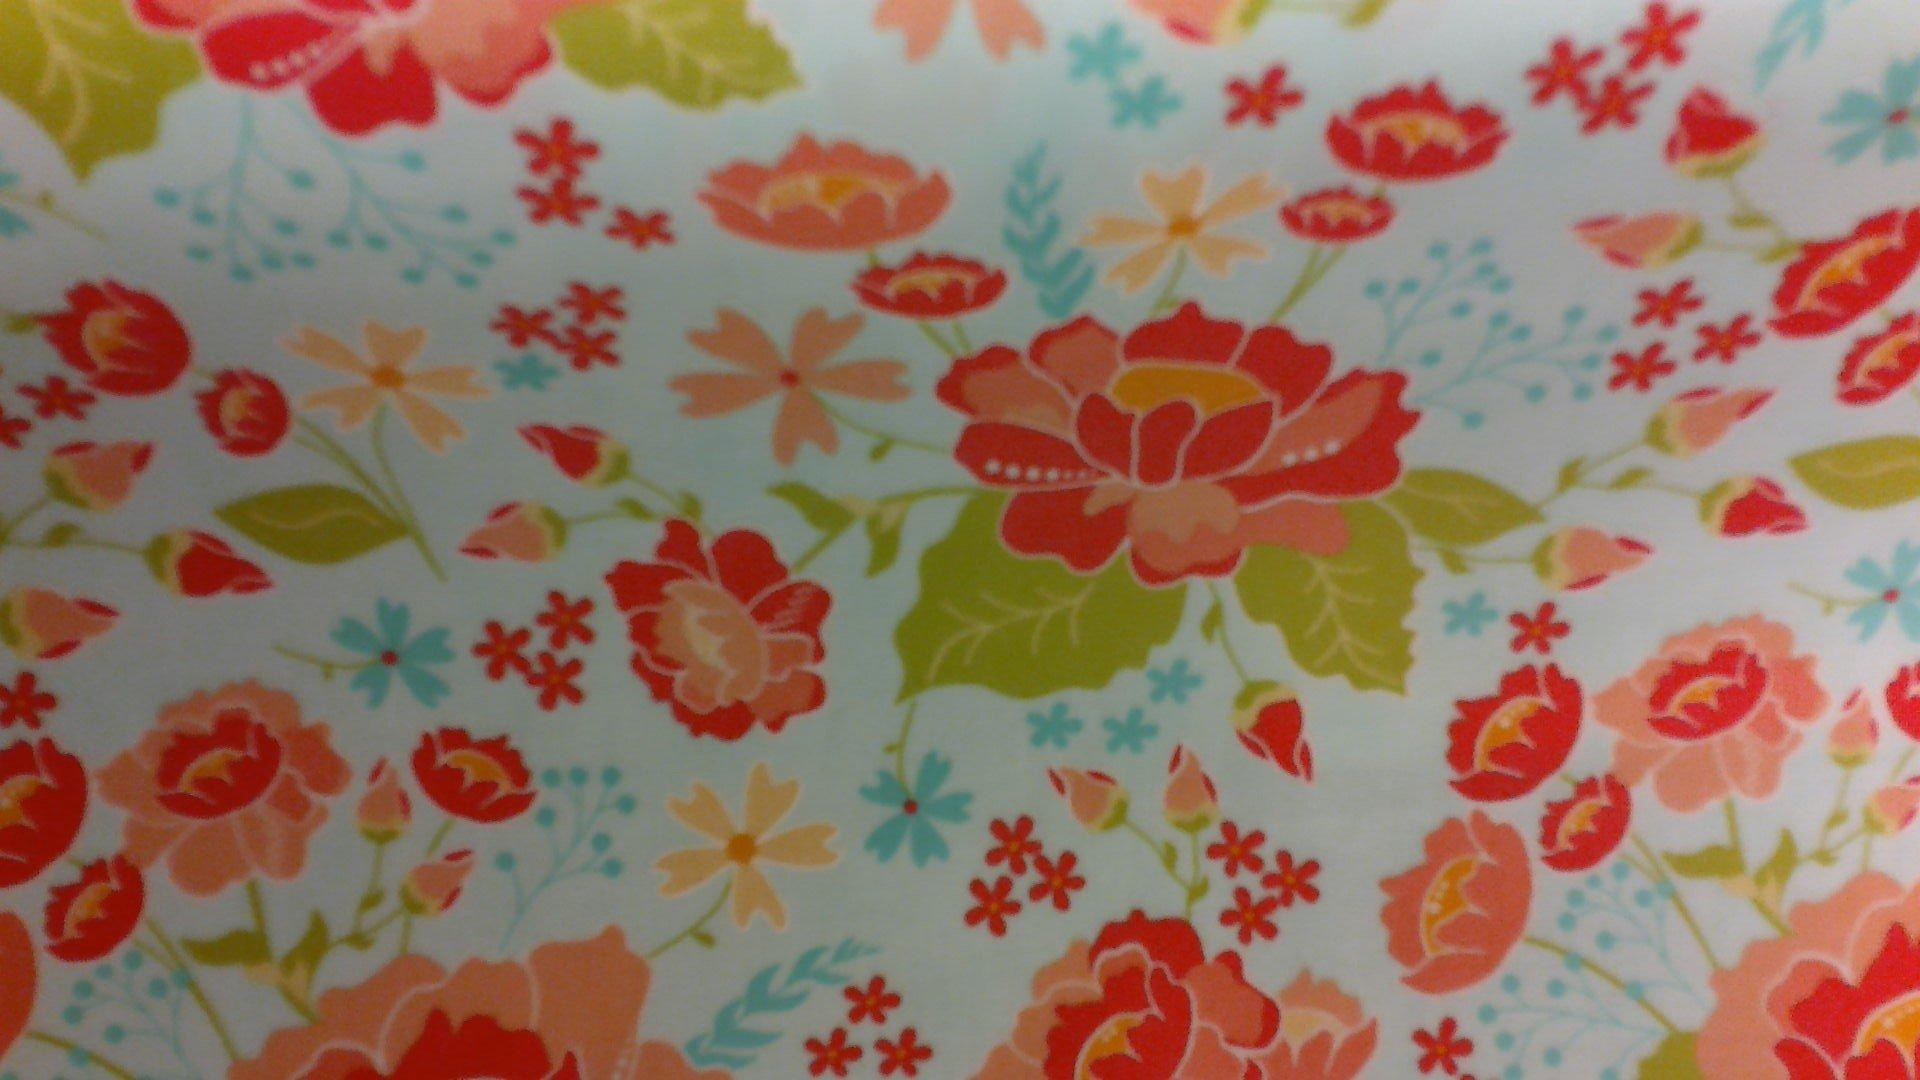 Laminated Cotton - Lulu Lane 29020-19C